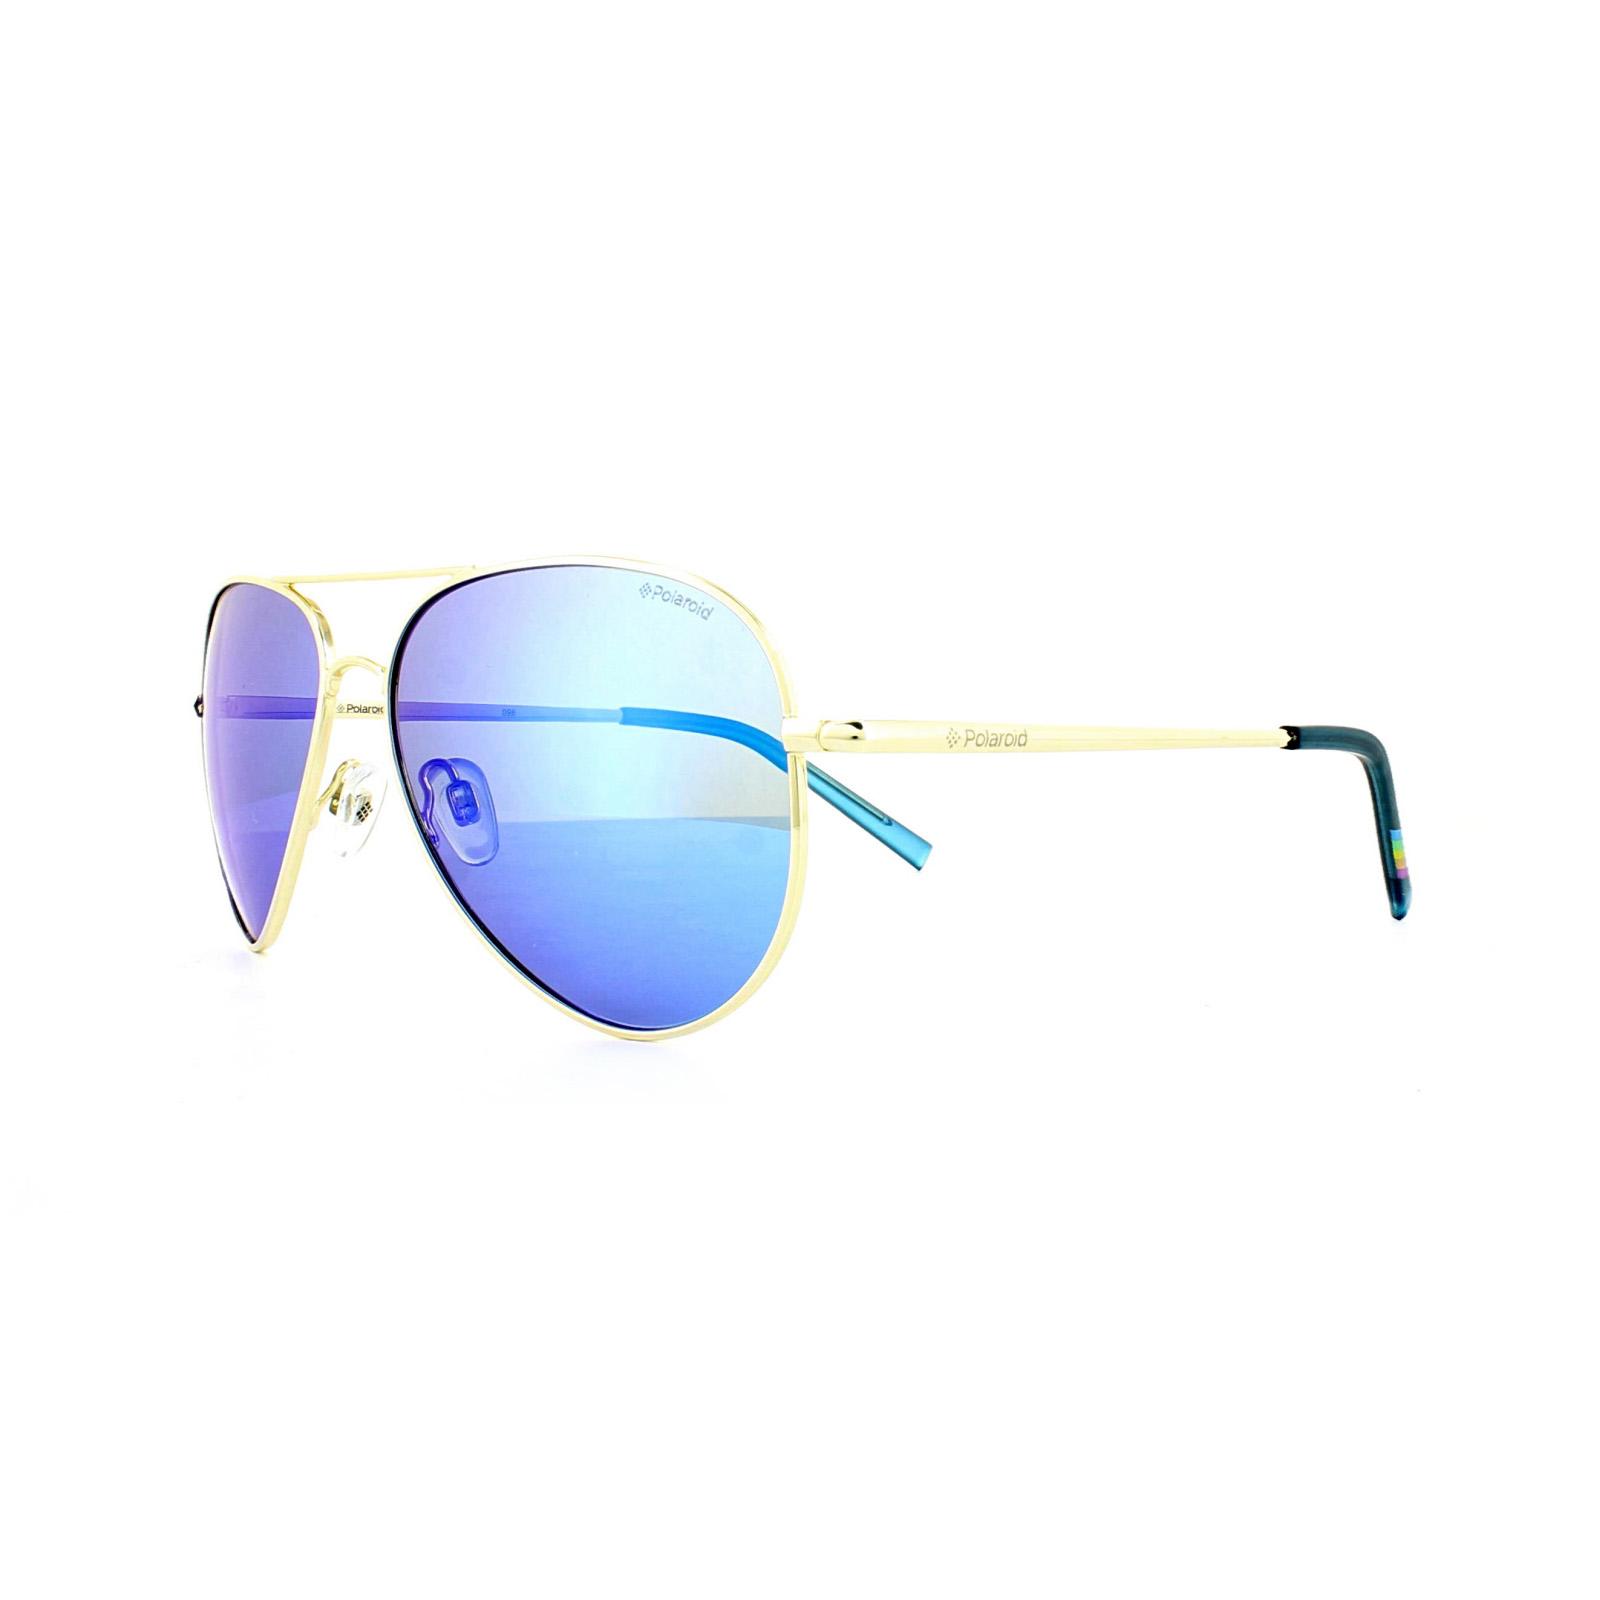 b6ec8c06123 Sentinel Polaroid Sunglasses 6012 N J5G JY Gold Grey Blue Mirror Polarized